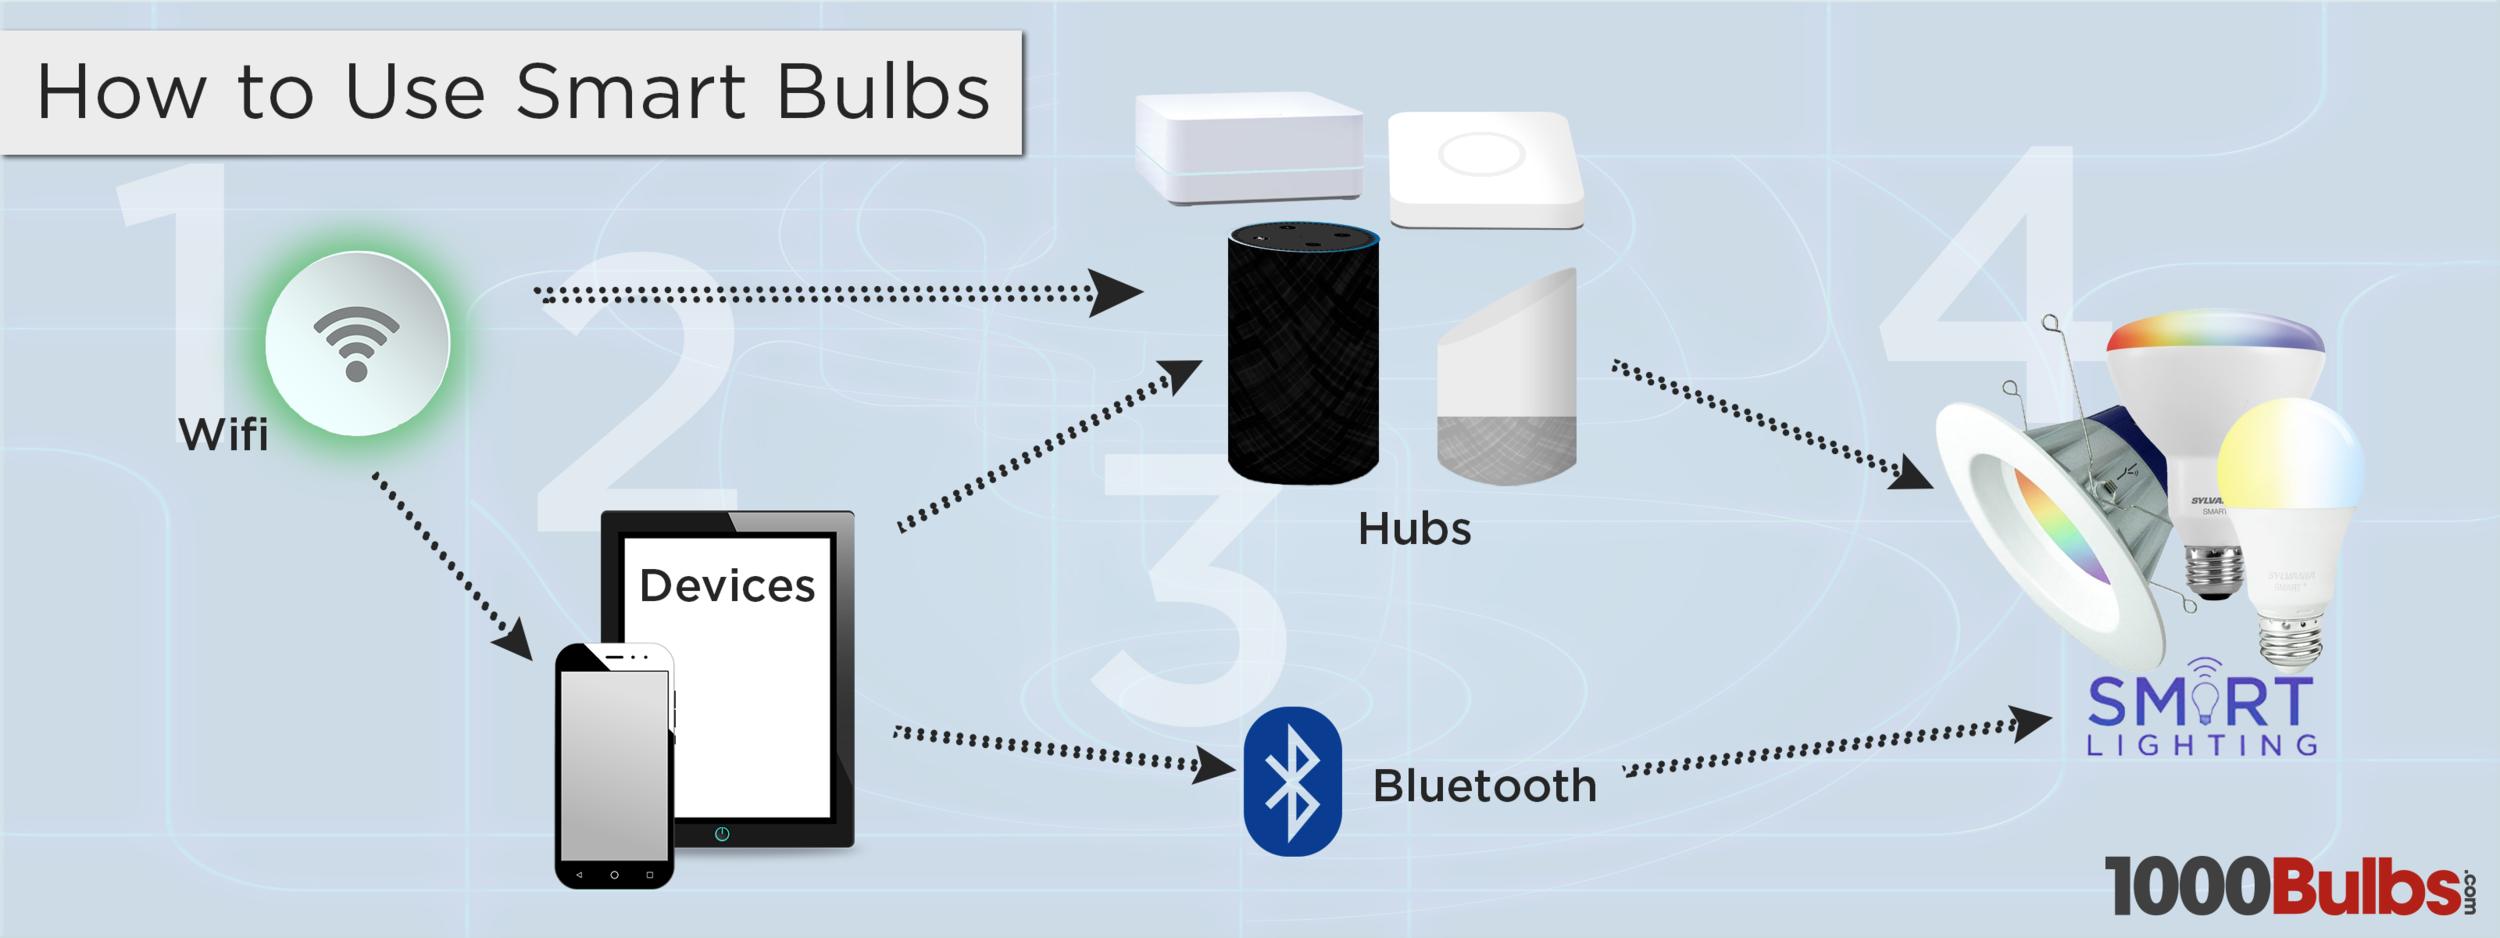 Conexión #1: Wifi => Bombillas Inteligentes (hub opcional) Conexión #2: Dispositivo => Bluetooth => Bombillas Inteligentes Conexión #3: Wifi => Dispositivo => Hub => Bombillas Inteligentes